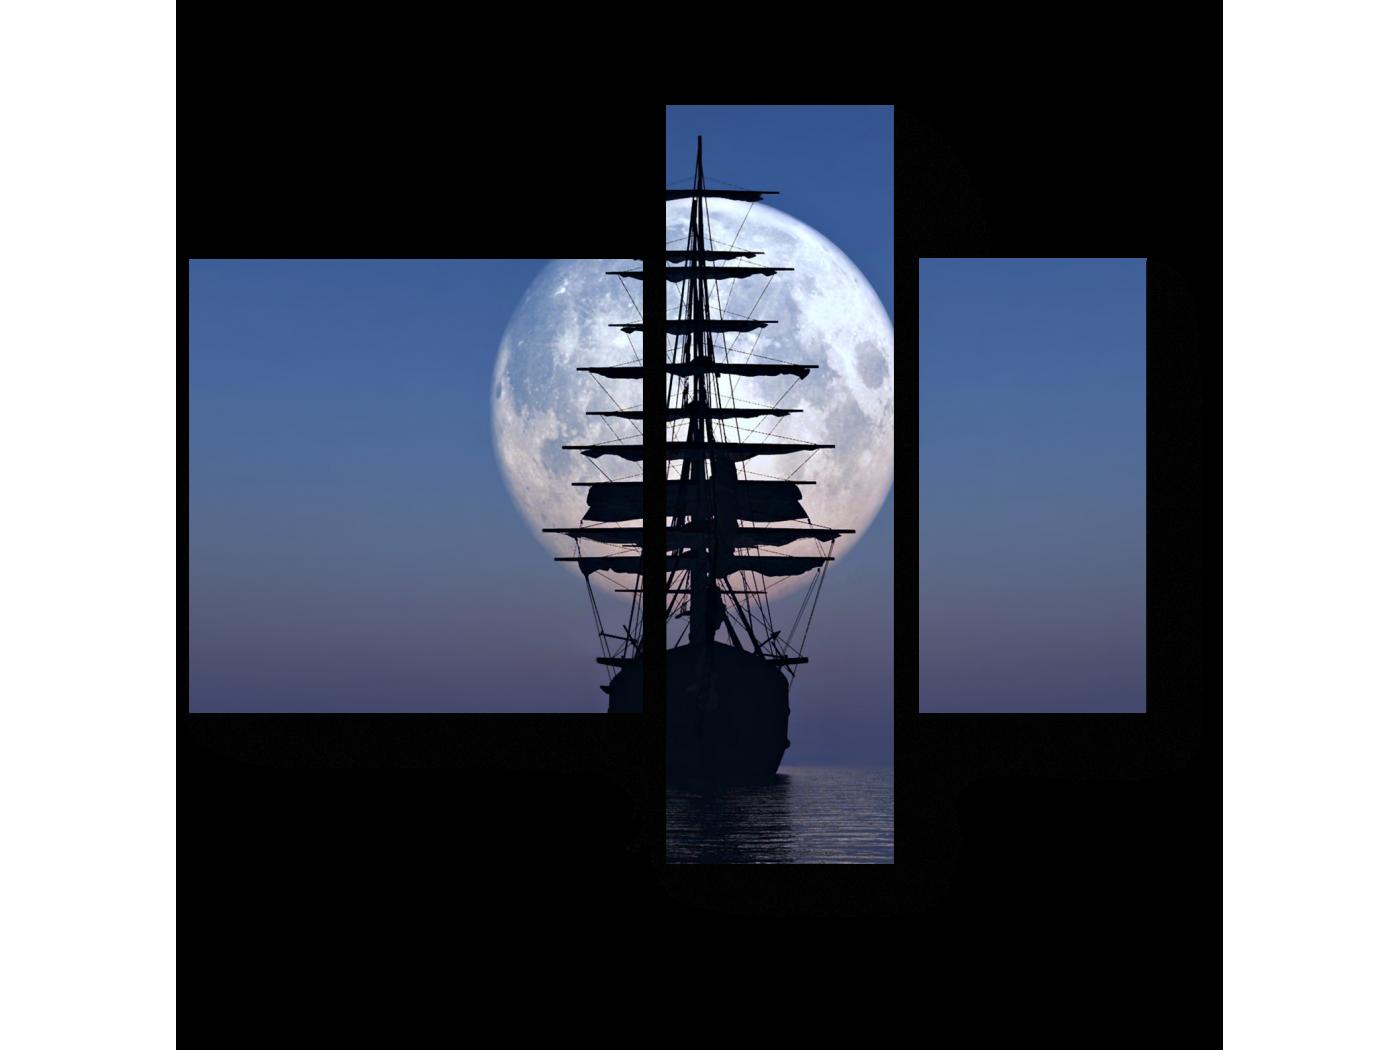 Модульная картина Полная луна (80x66) фото